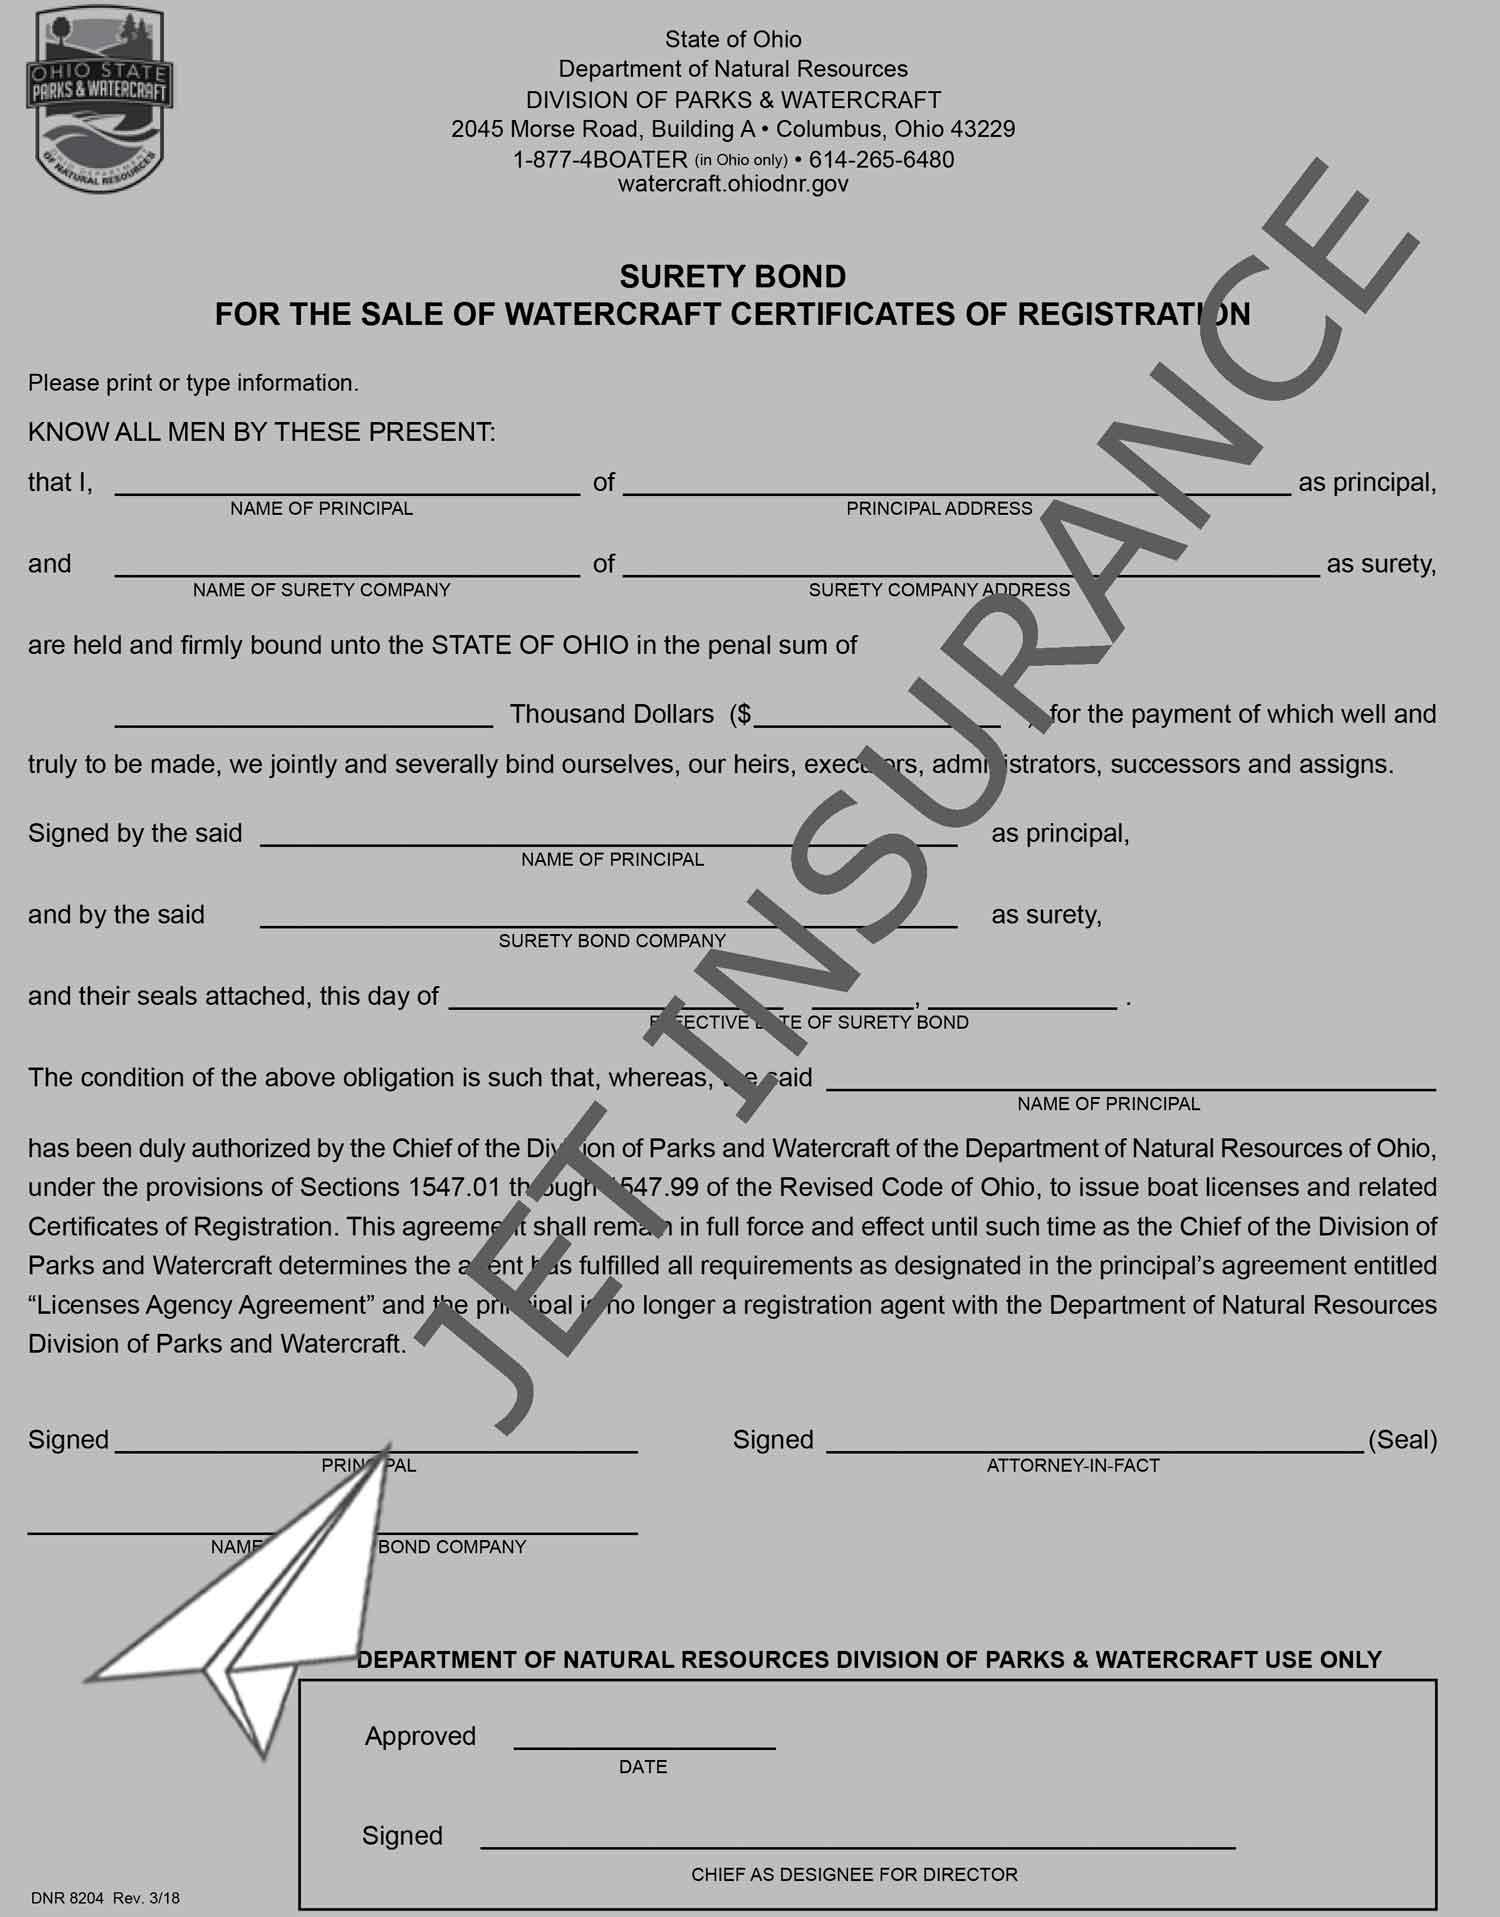 Ohio Boat Registration Agent Bond Form